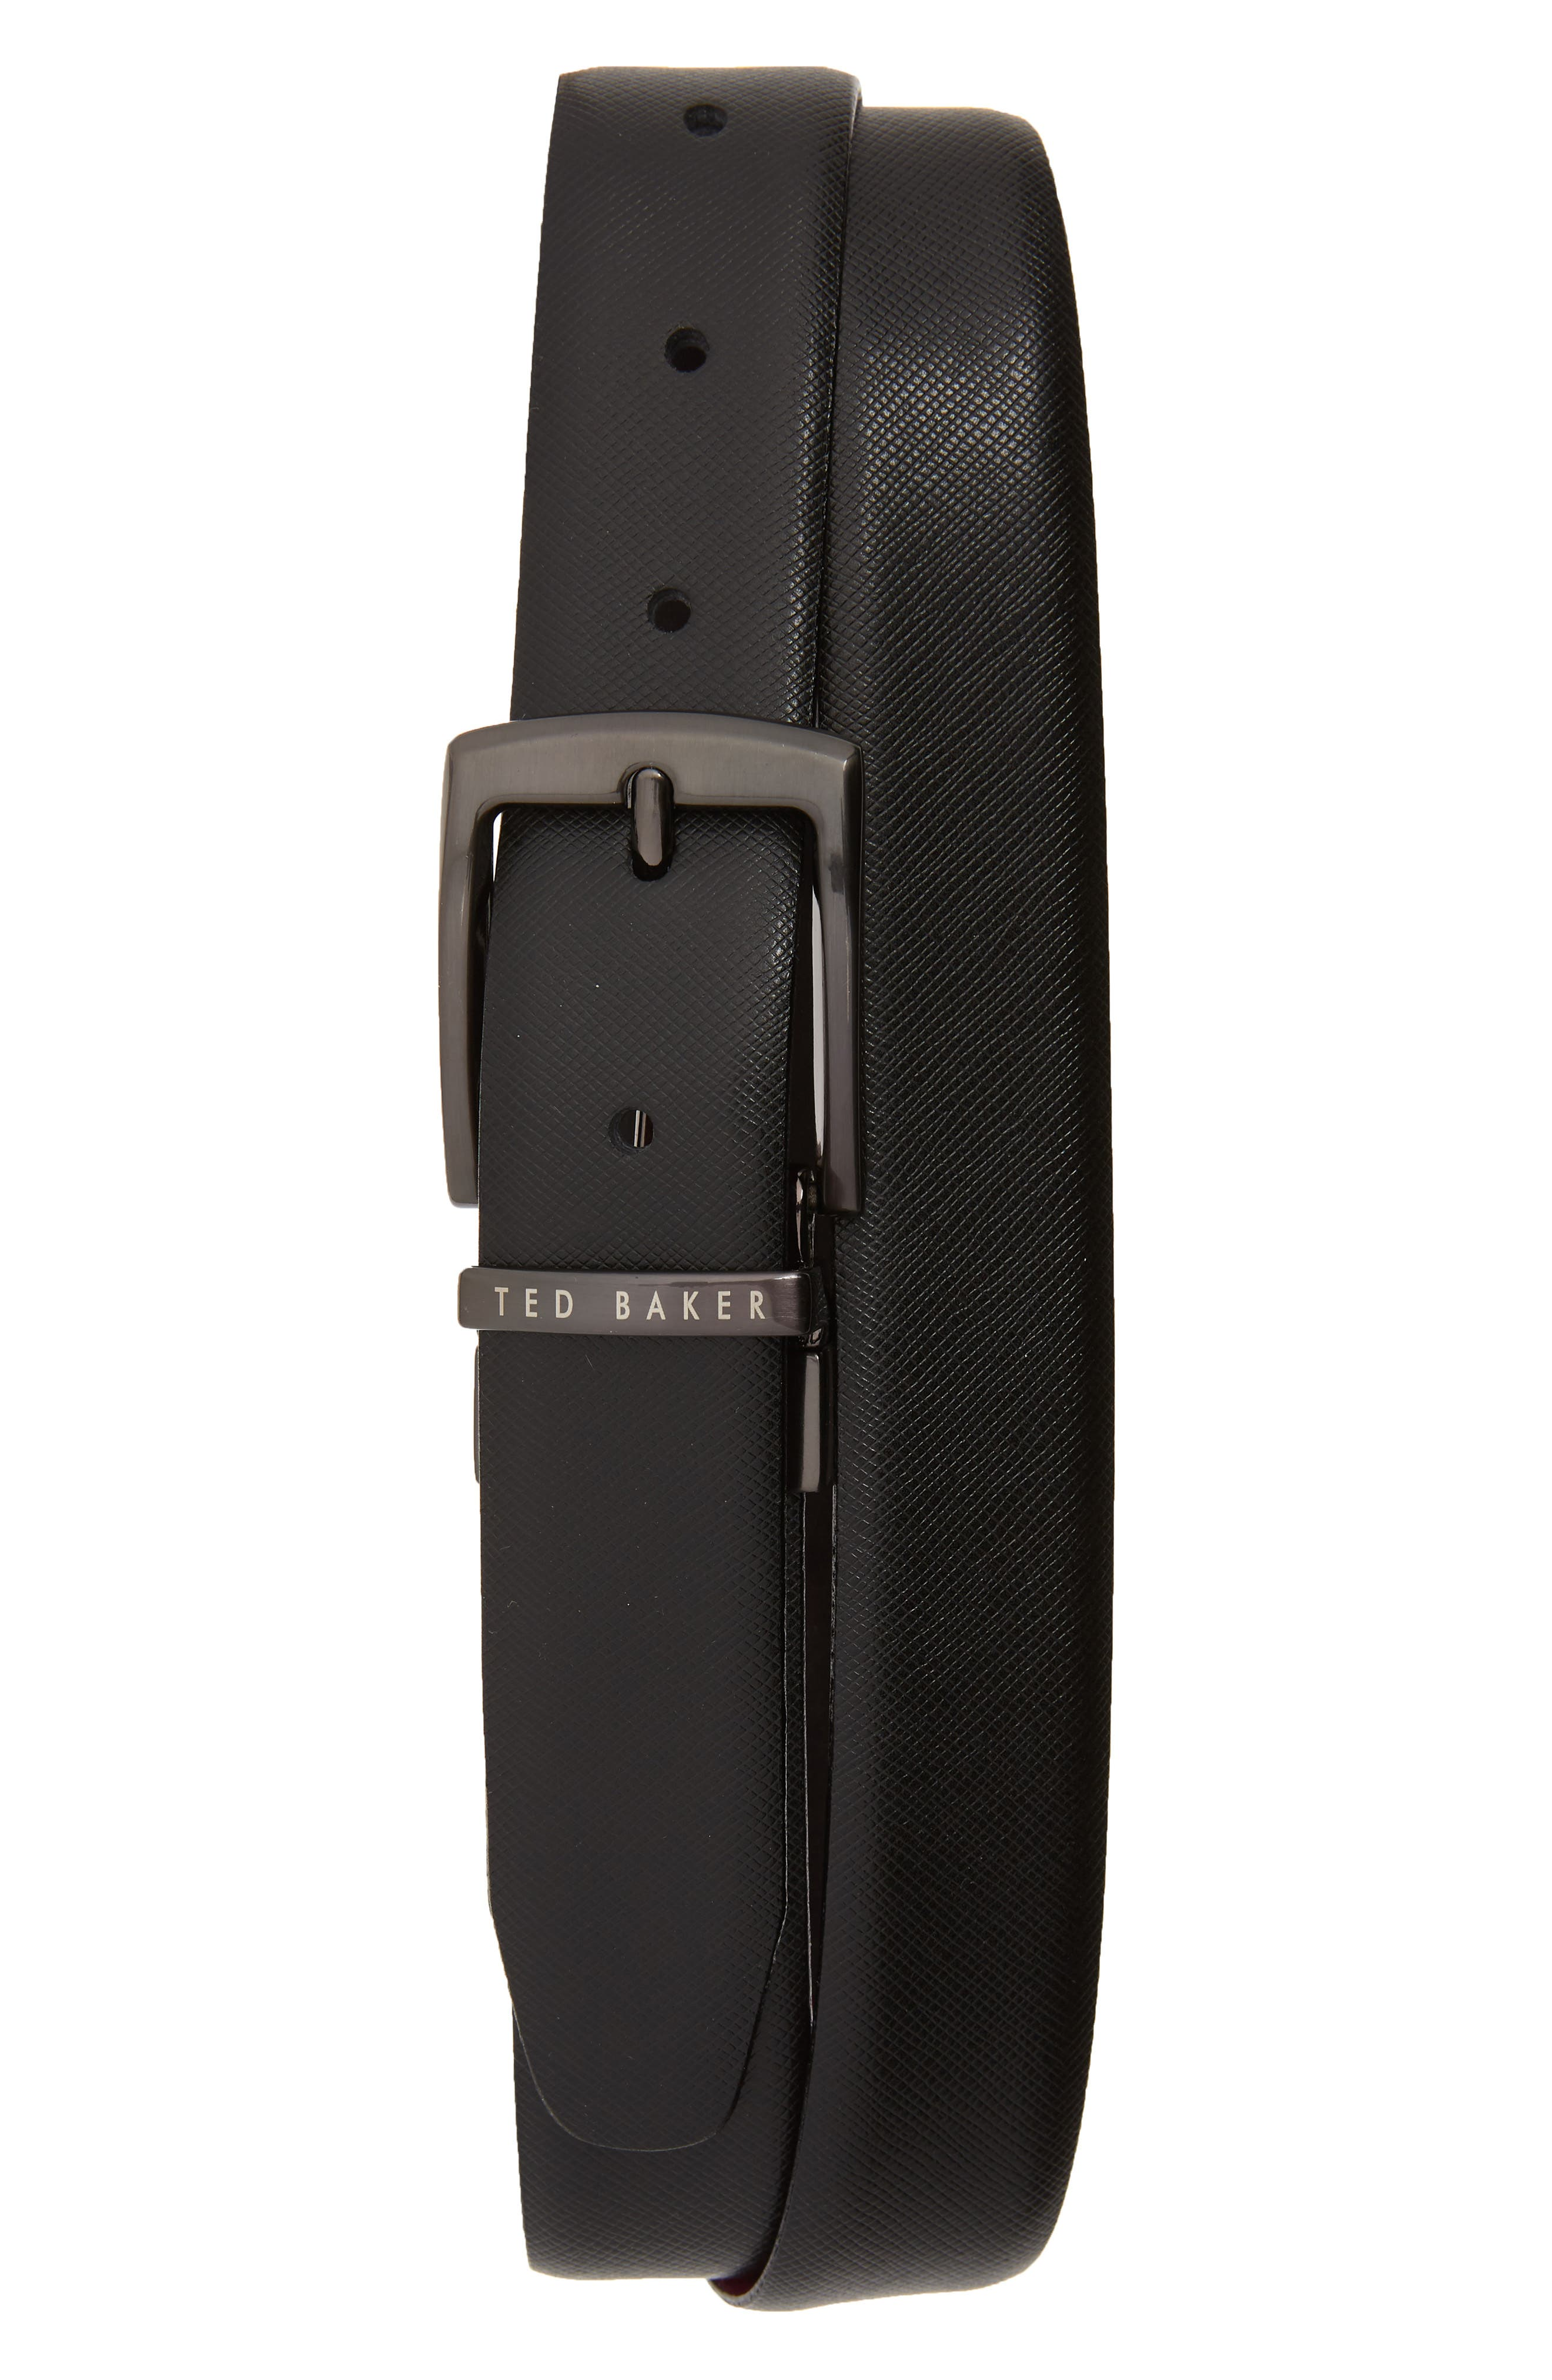 TED BAKER LONDON Reversible Leather Belt, Main, color, BLACK